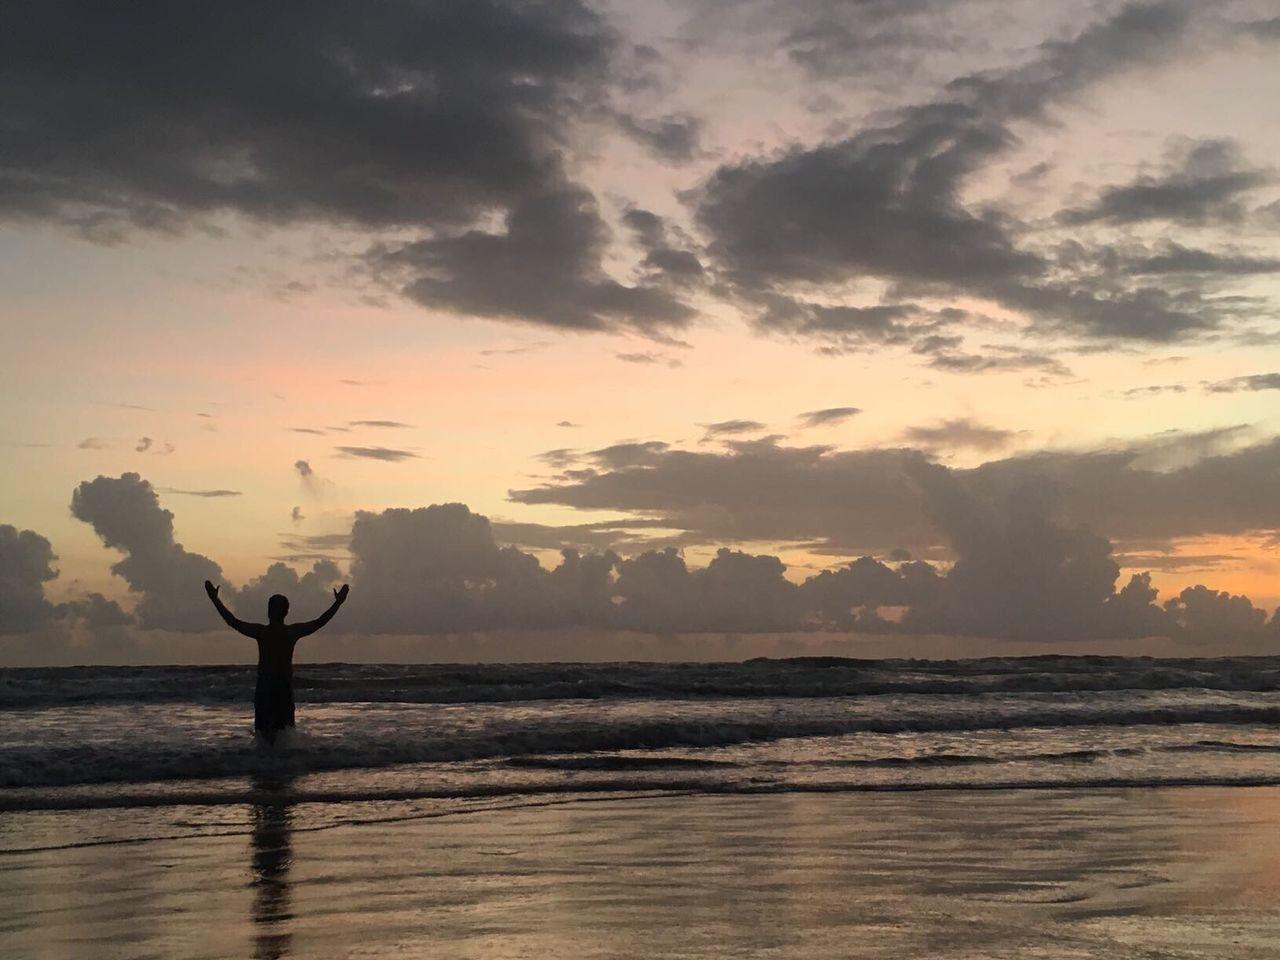 Man in the sea Sea Arabian Goa Goa India Morjim Calangute India Travel India Goa ❤❤ Goan Man Praying Sea And Sky Seaside Seascape Sea View Human